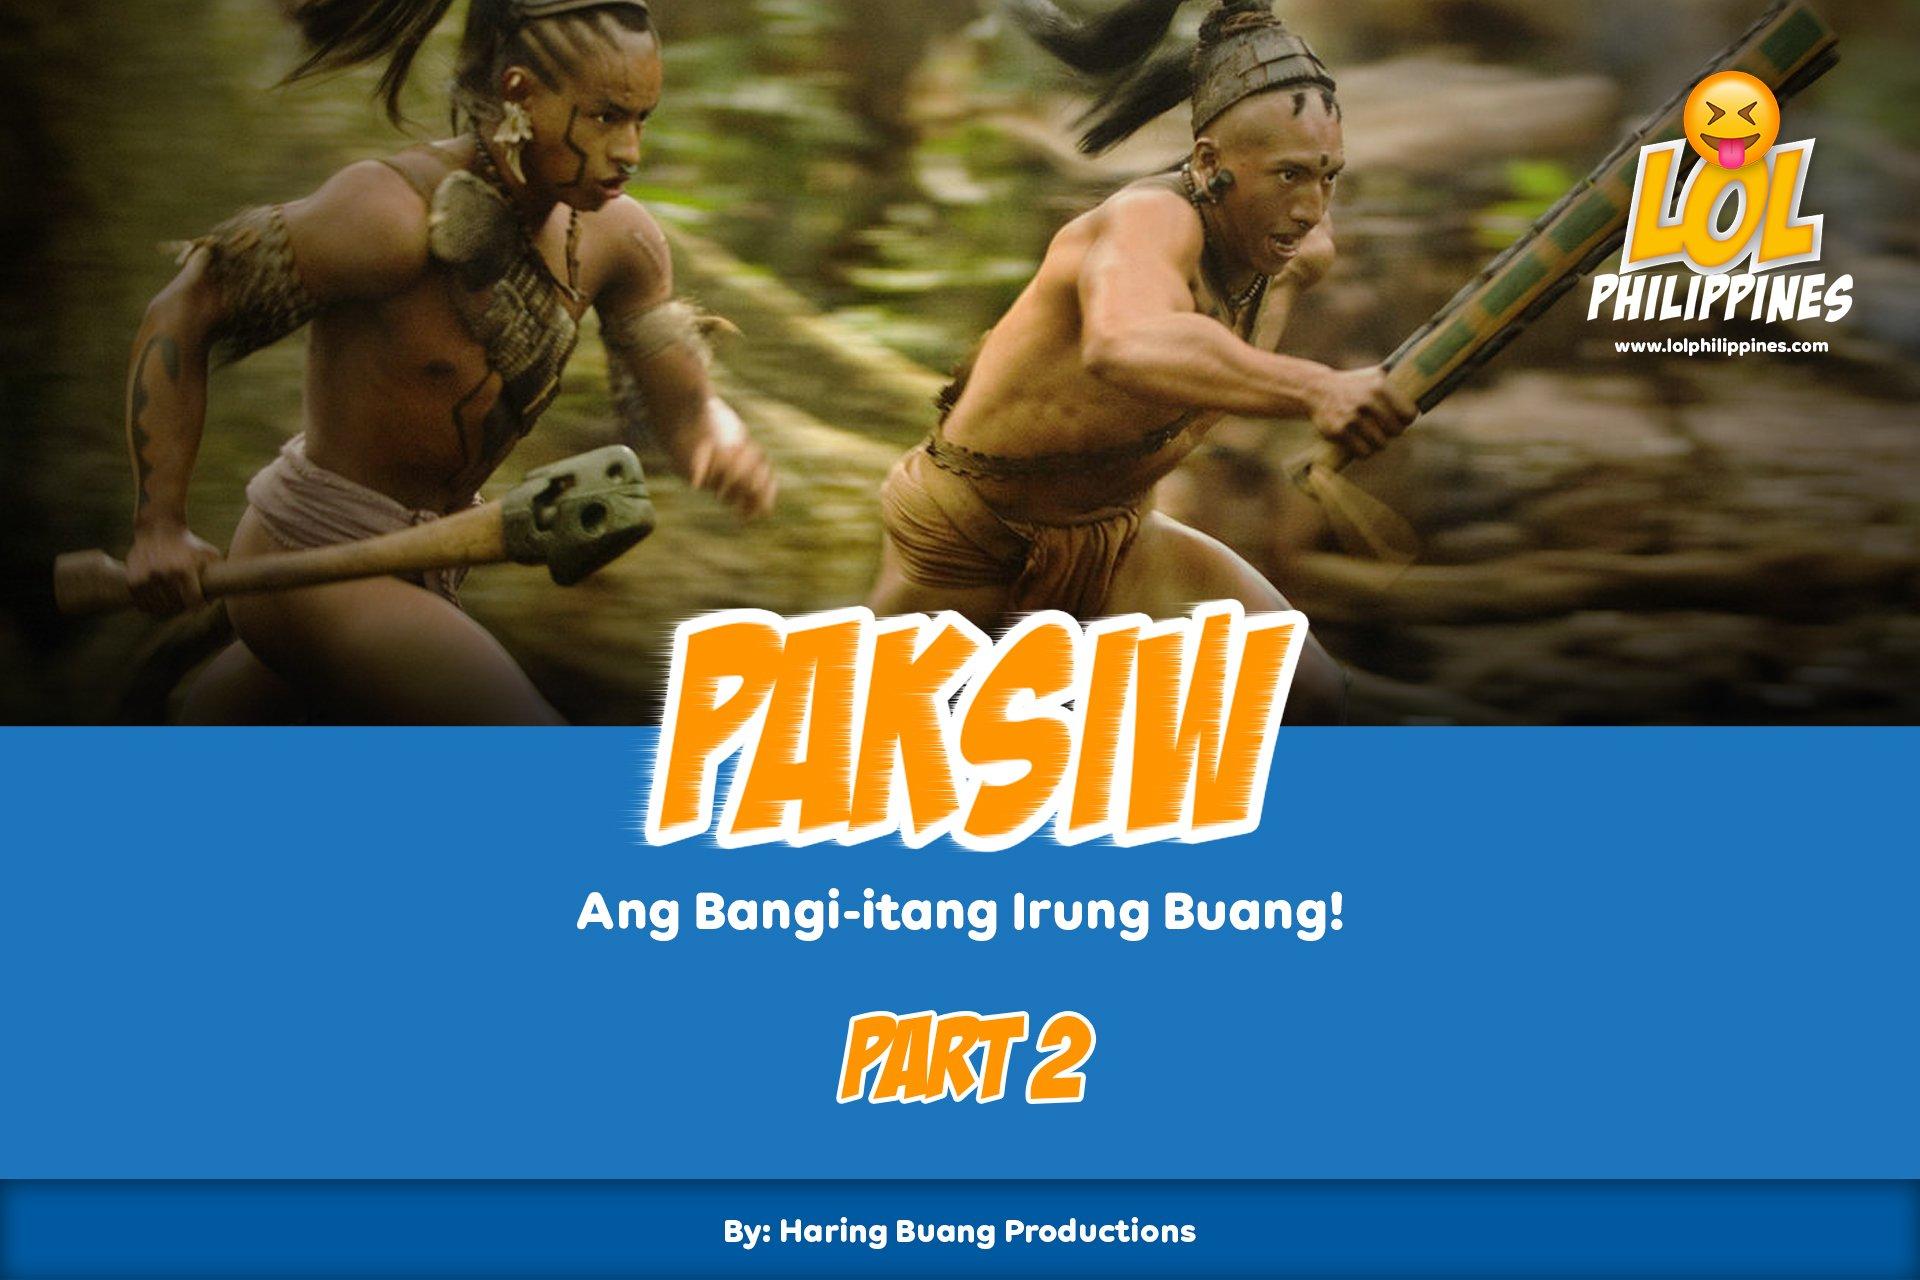 LOL Philippines Paksiw Part 2